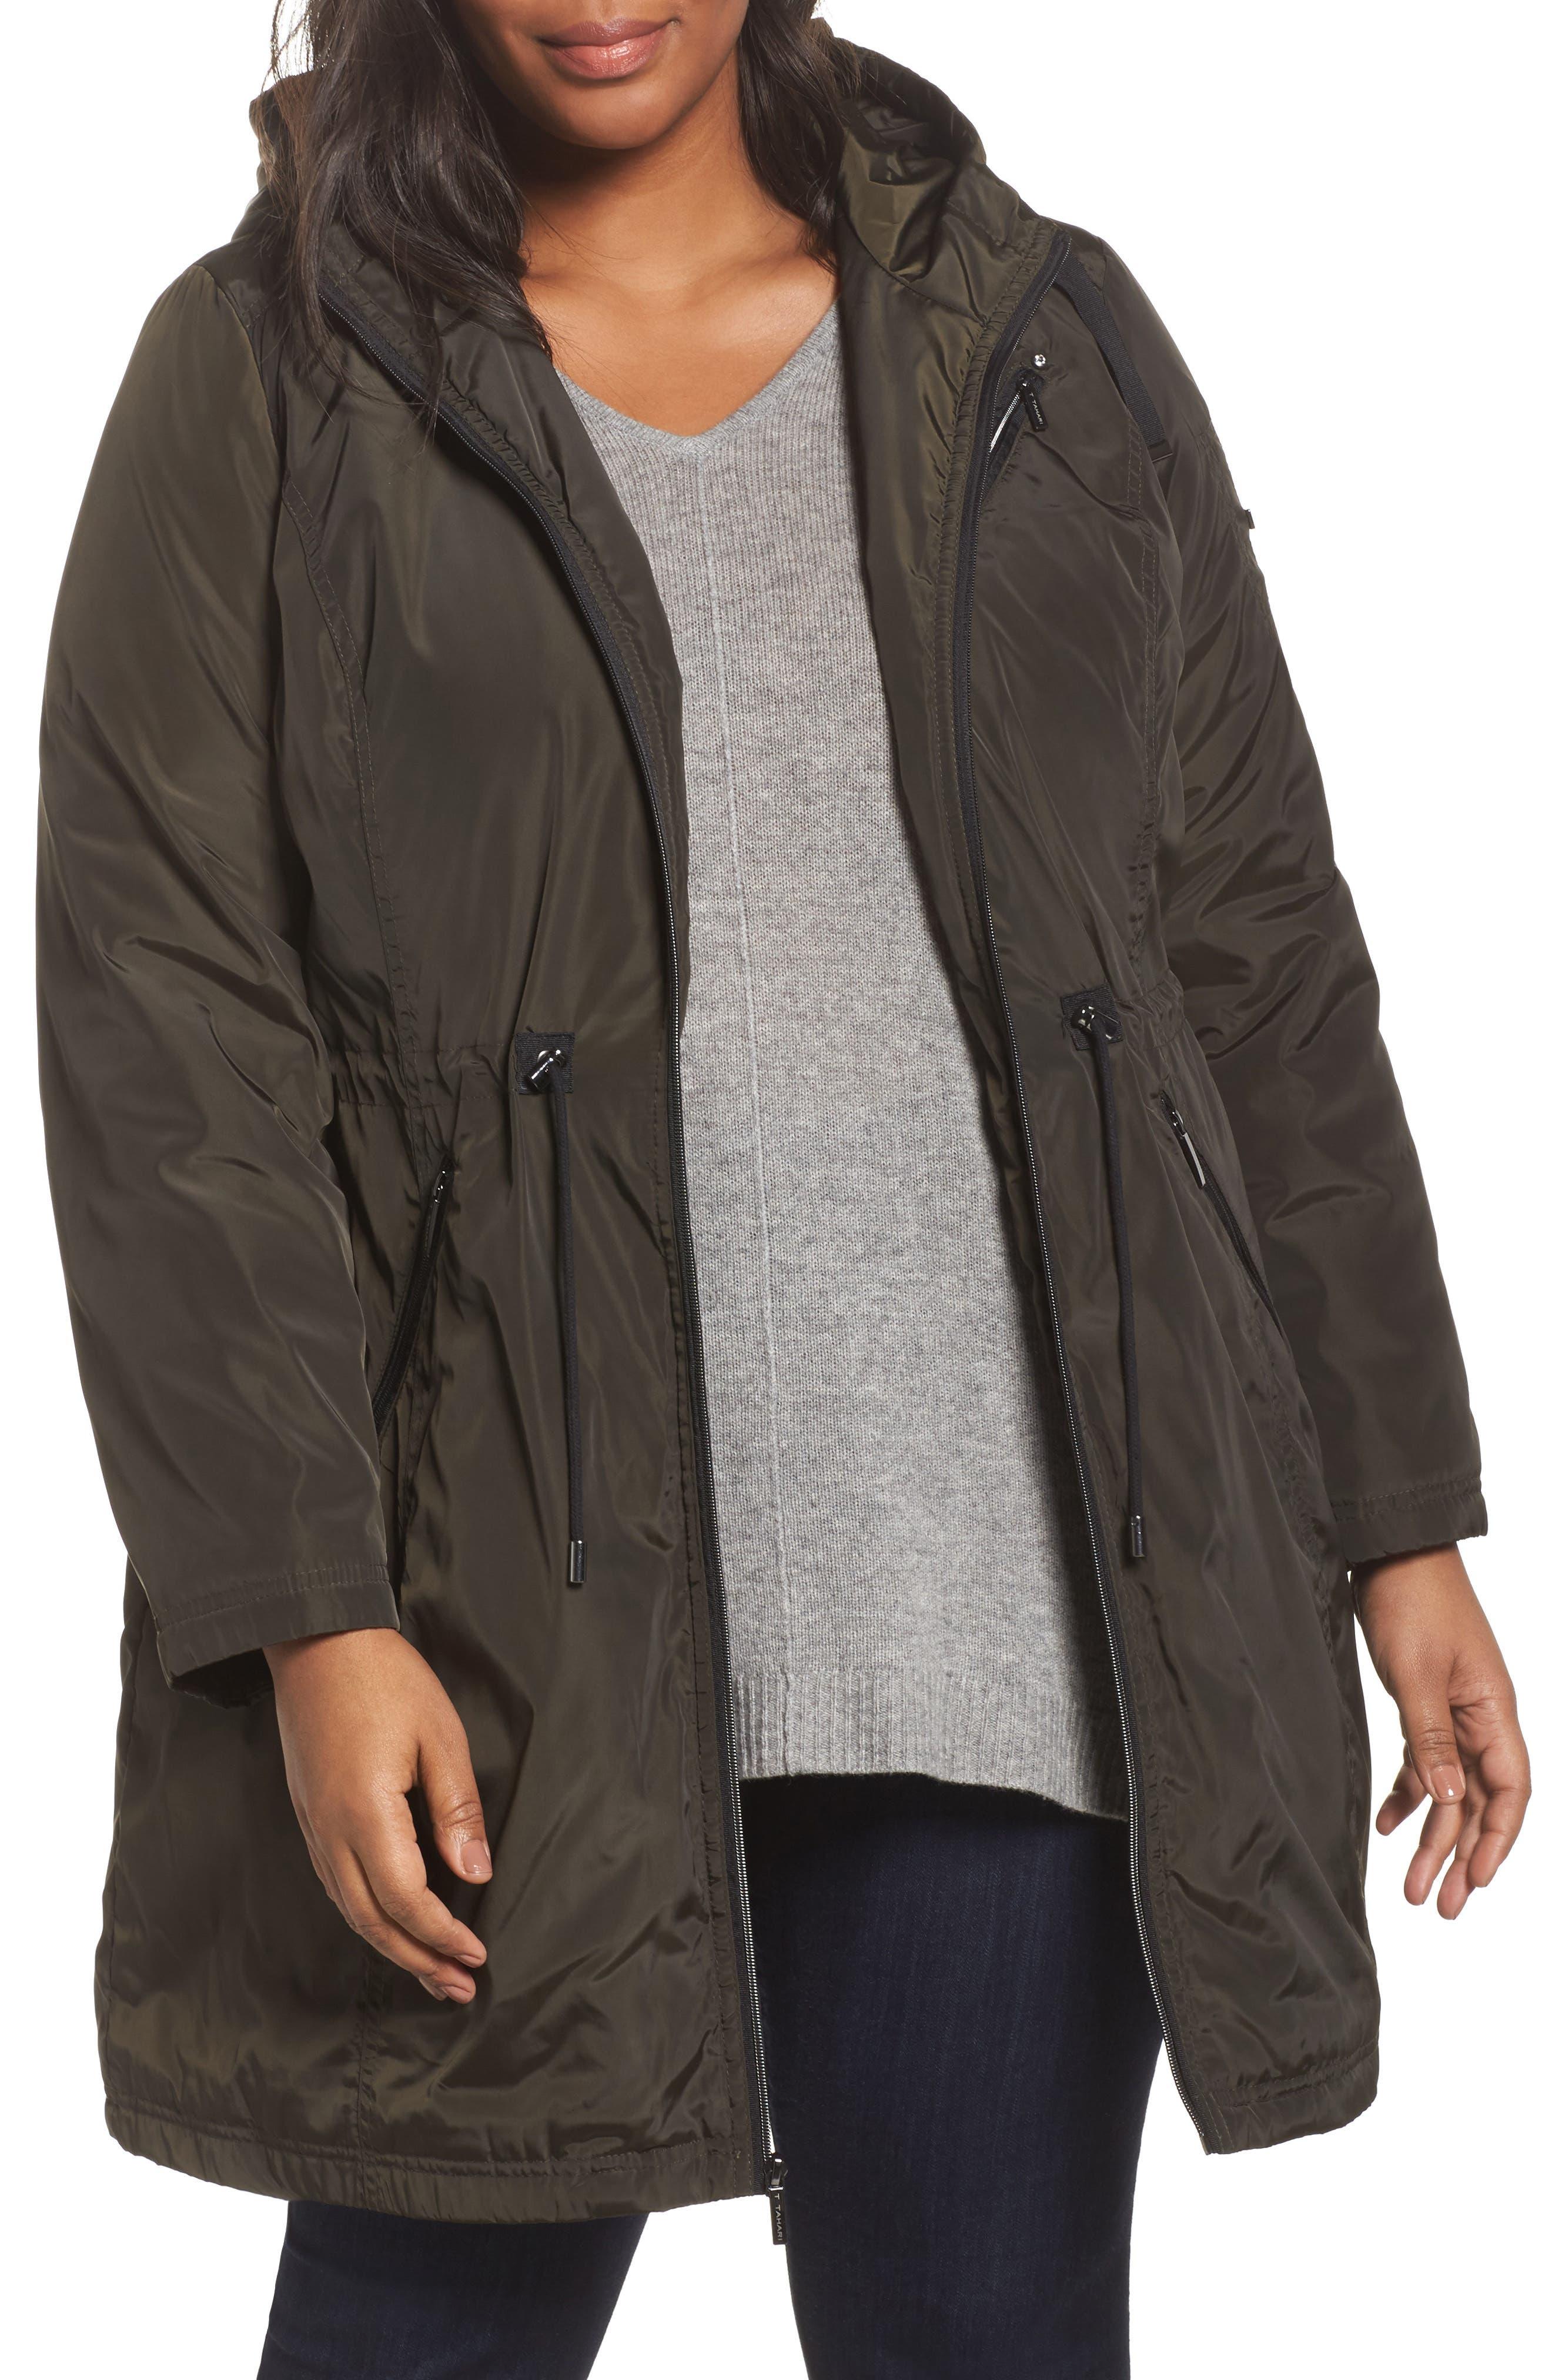 Tiffany Raincoat,                         Main,                         color, Olive